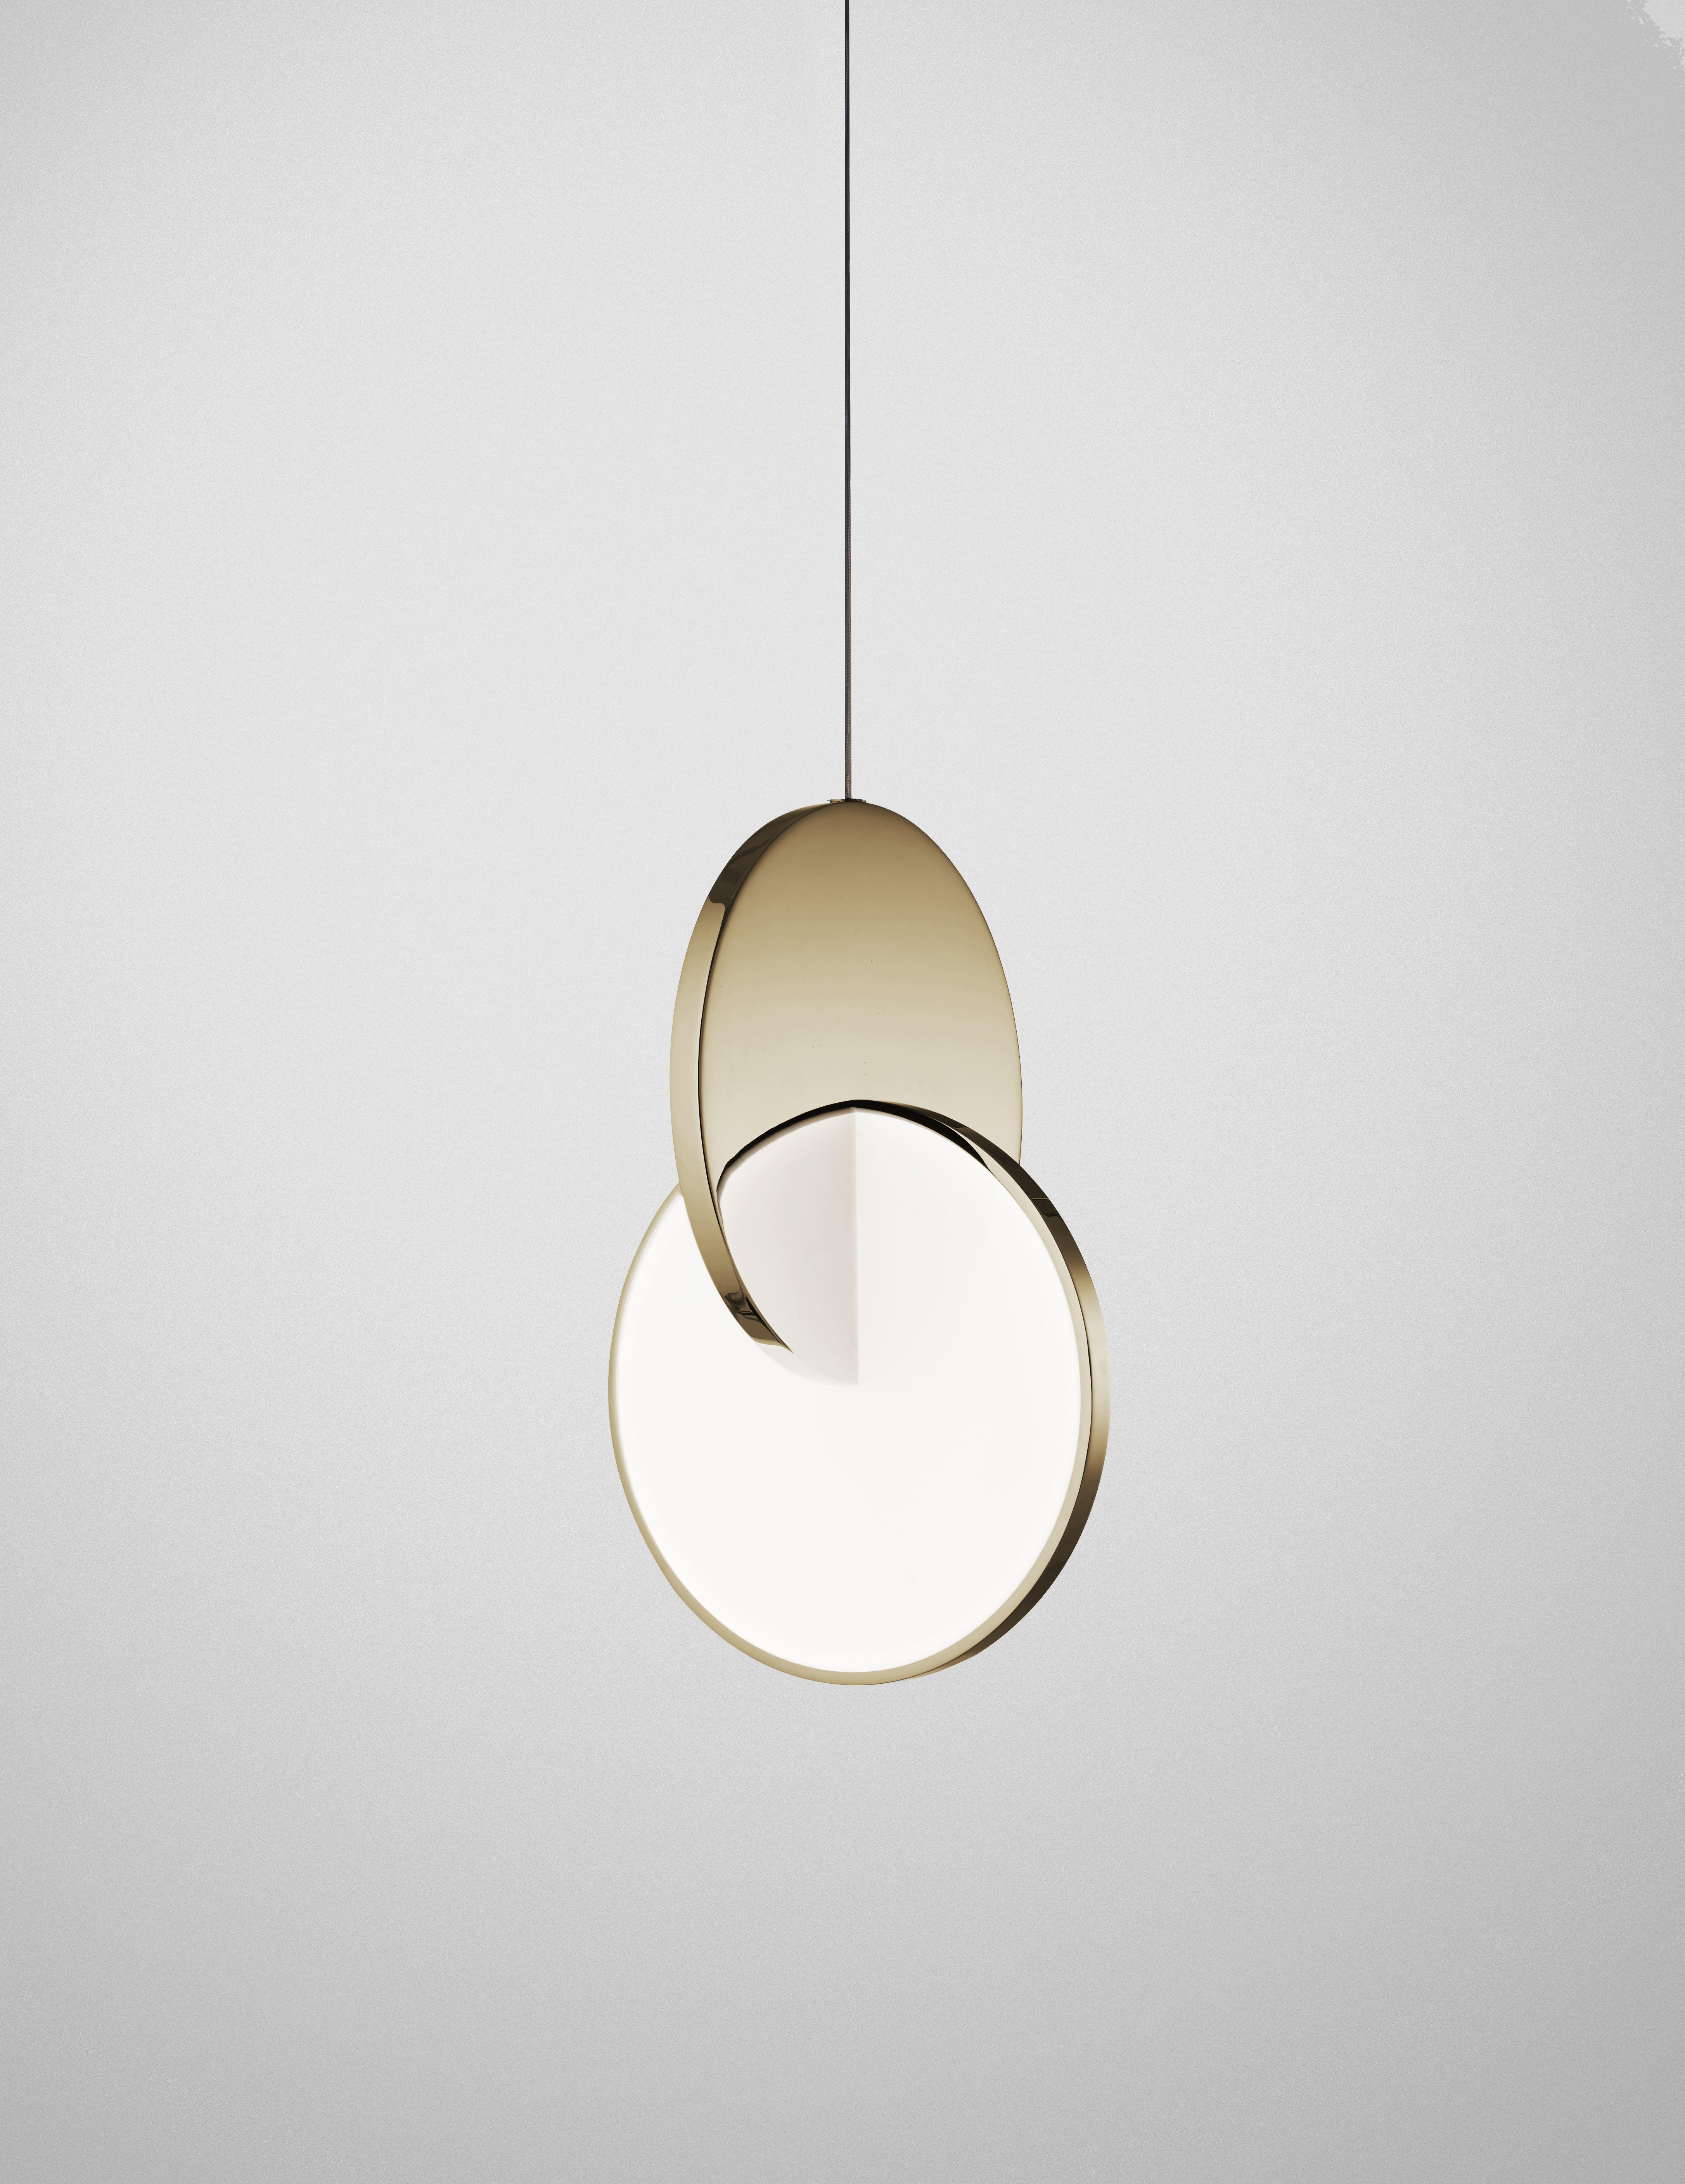 Eclipse Pendant Polished Gold Leebroom Pendant Light Light Light Architecture